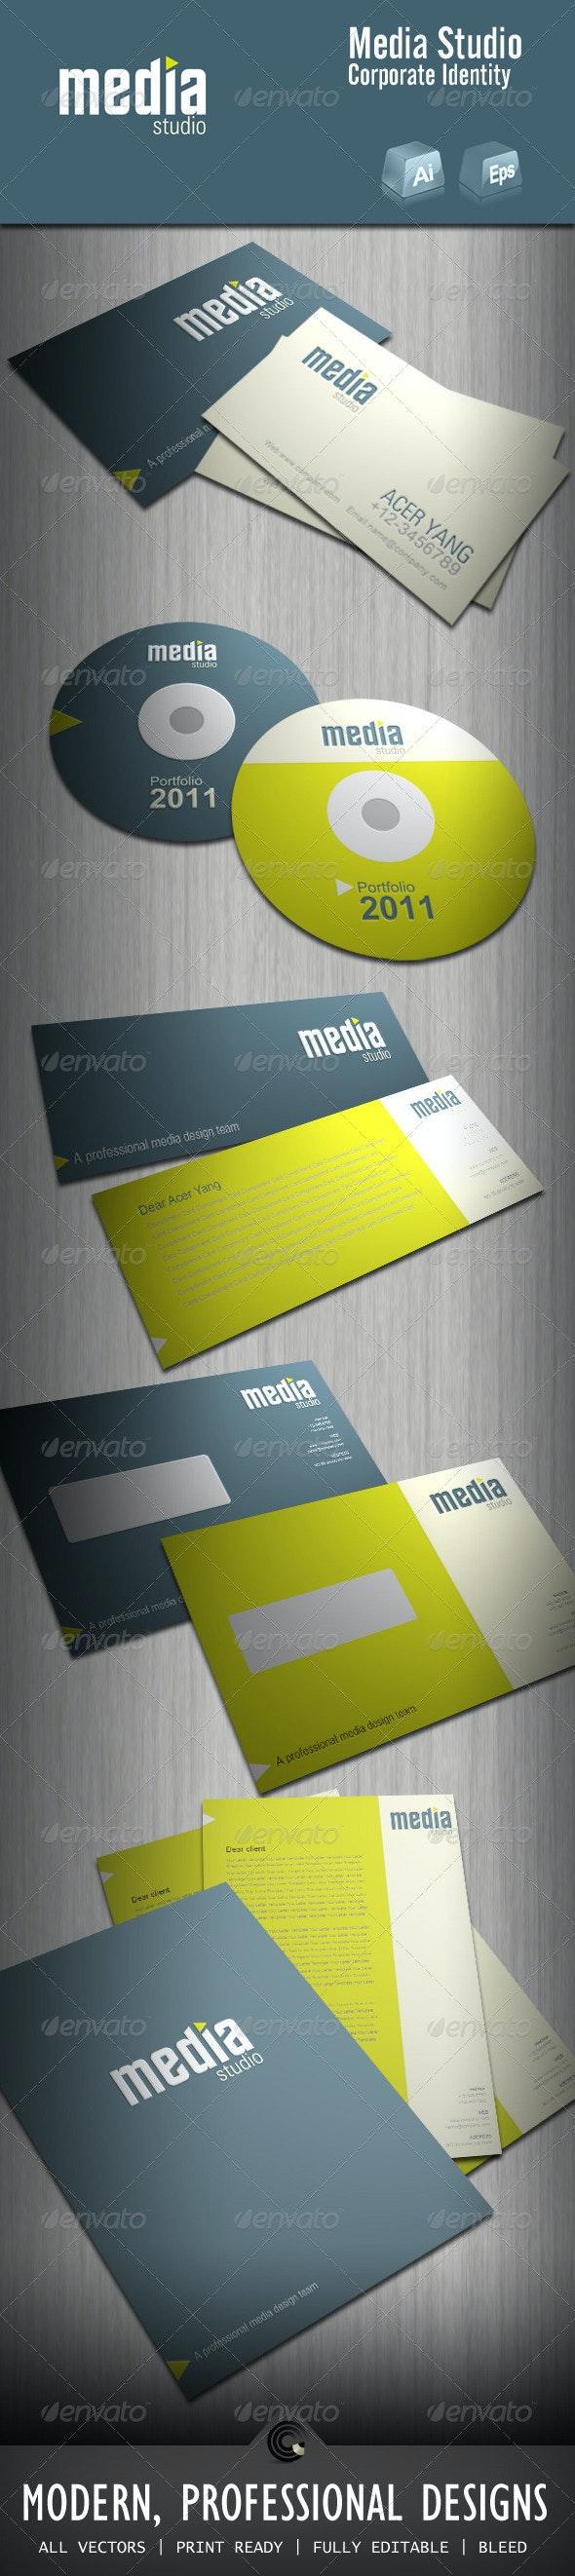 Media Studio Corporate Identity - Stationery Print Templates